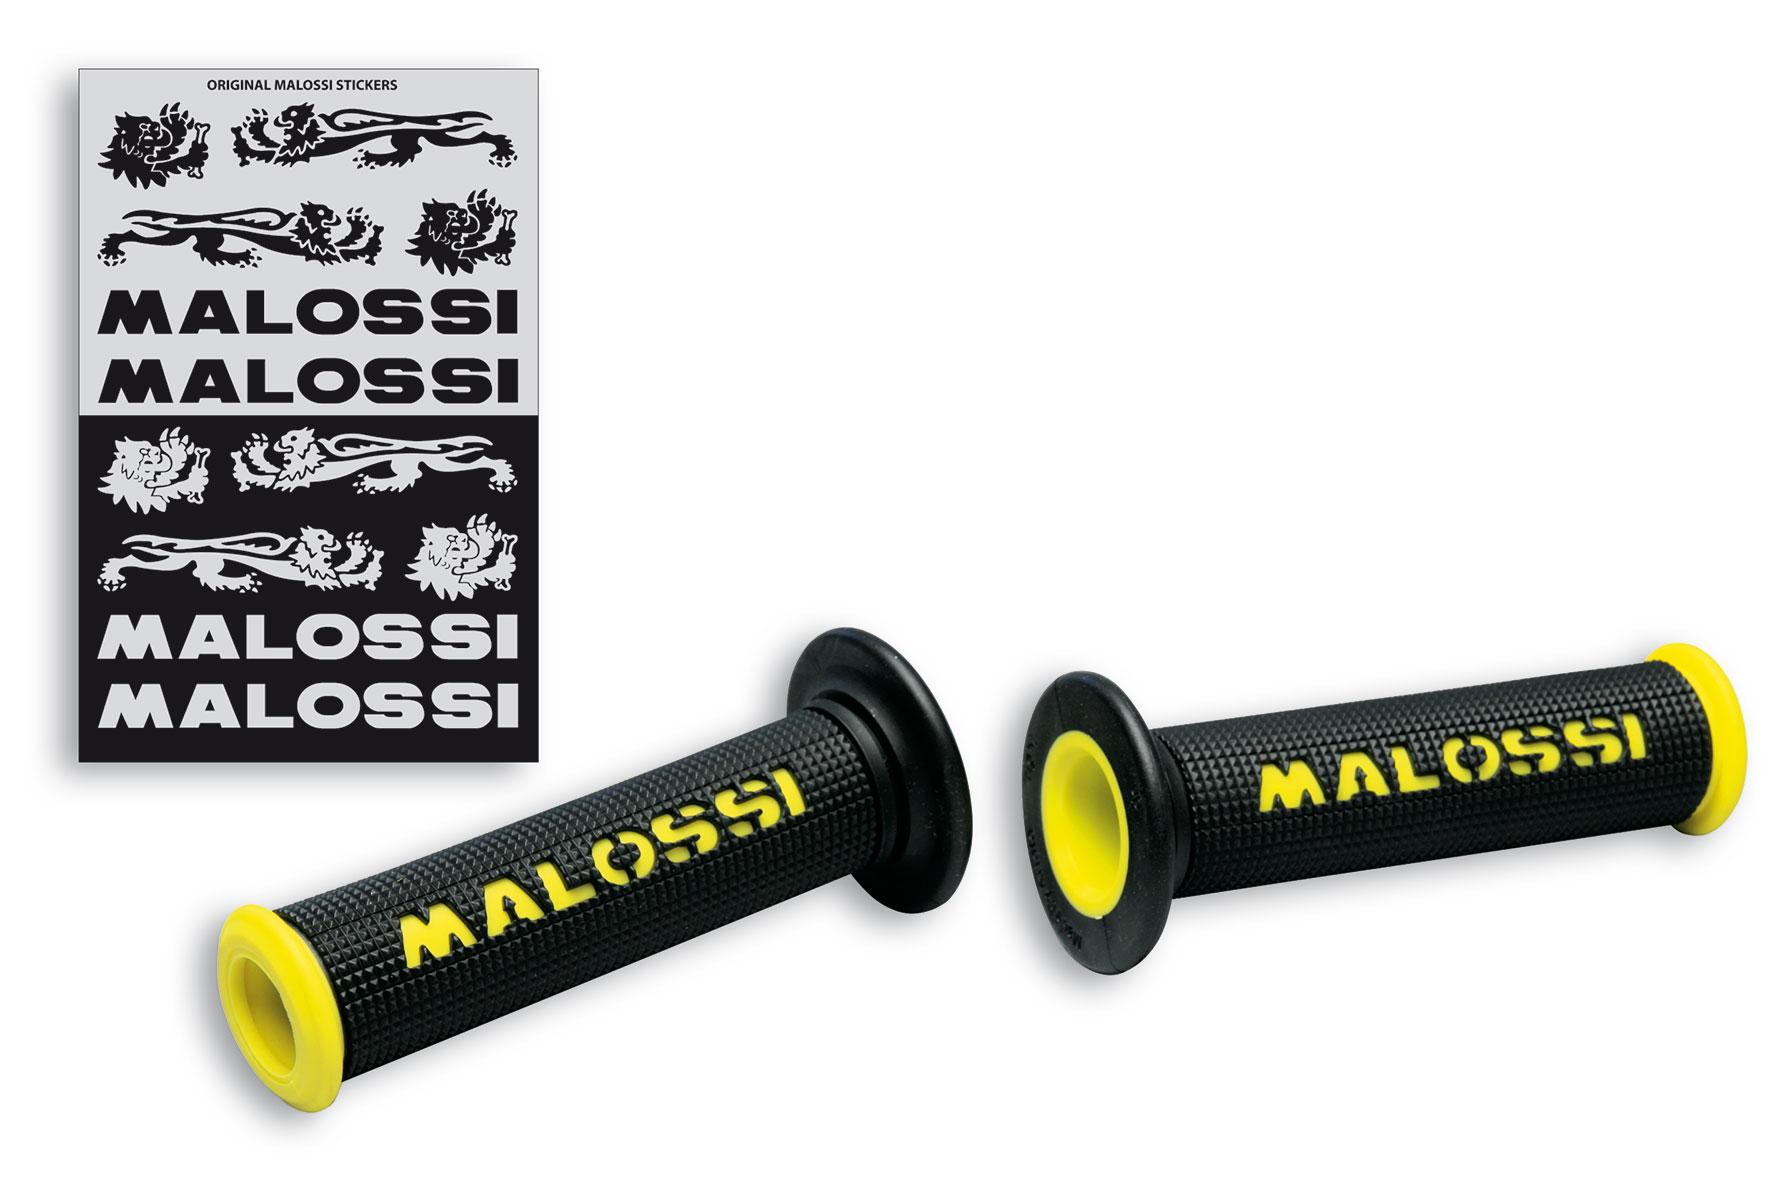 2 puños negros con logo Malossi amarillo - modelo sin cierre lateral